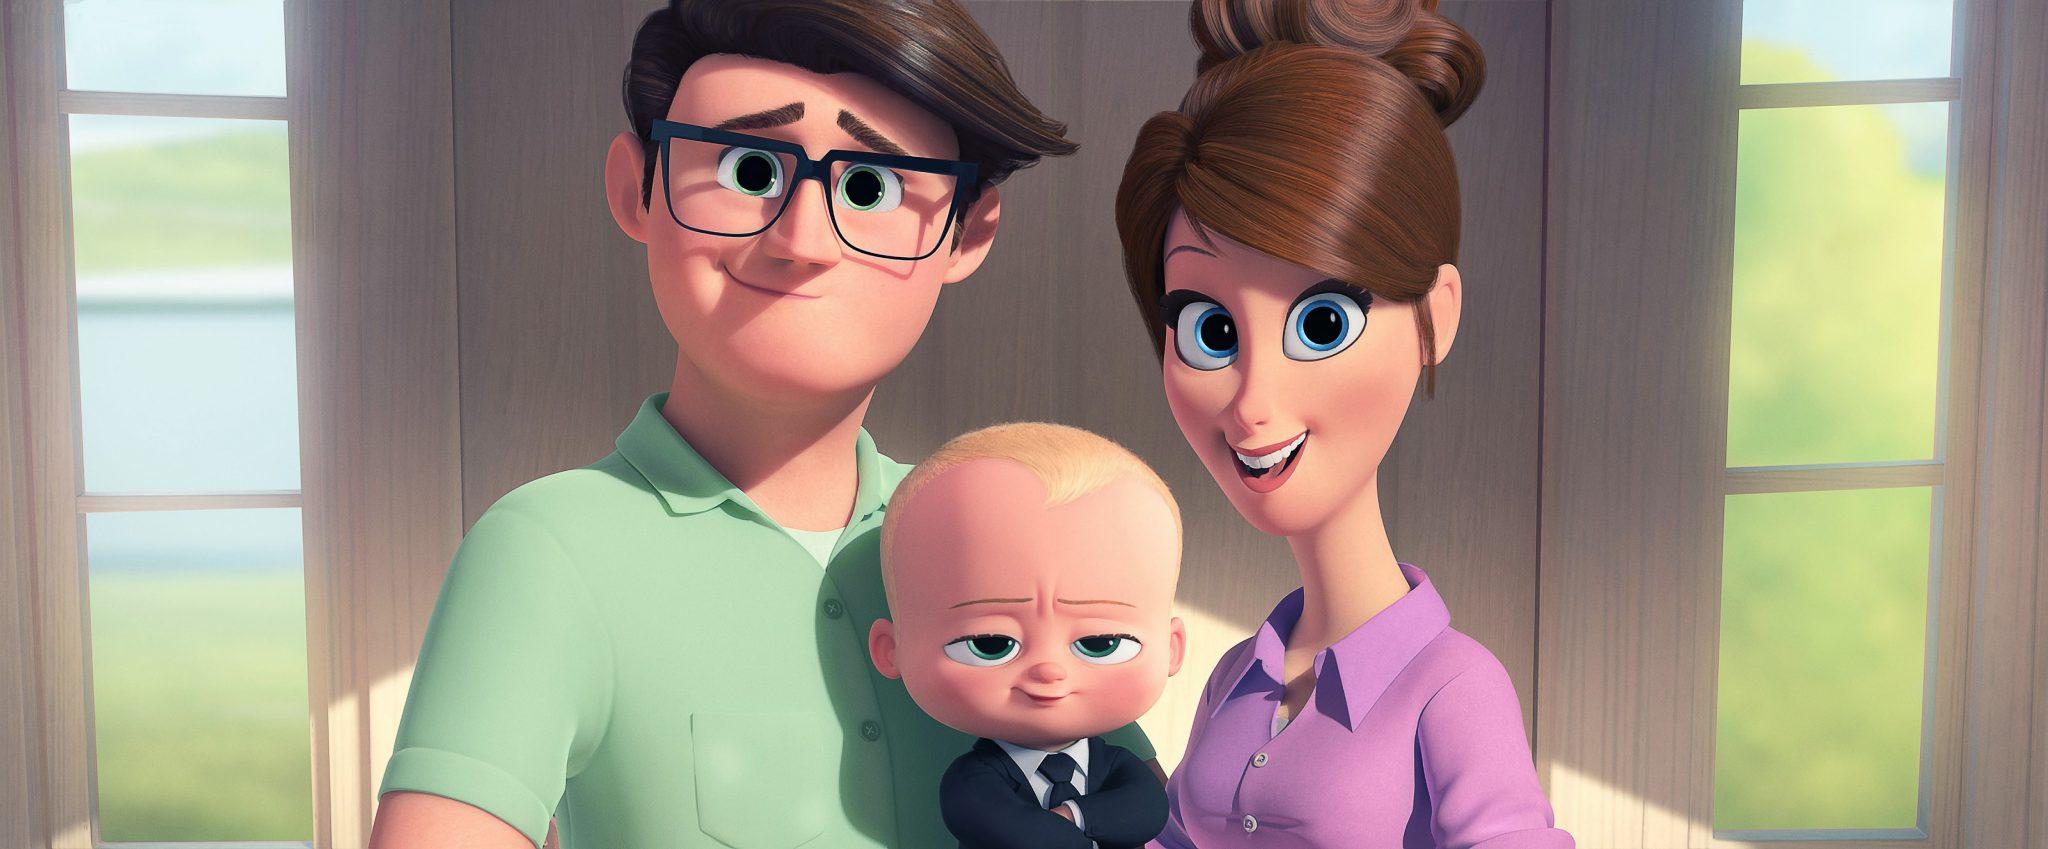 انیمیشن The Boss Baby بچه رئیس محصول 2017